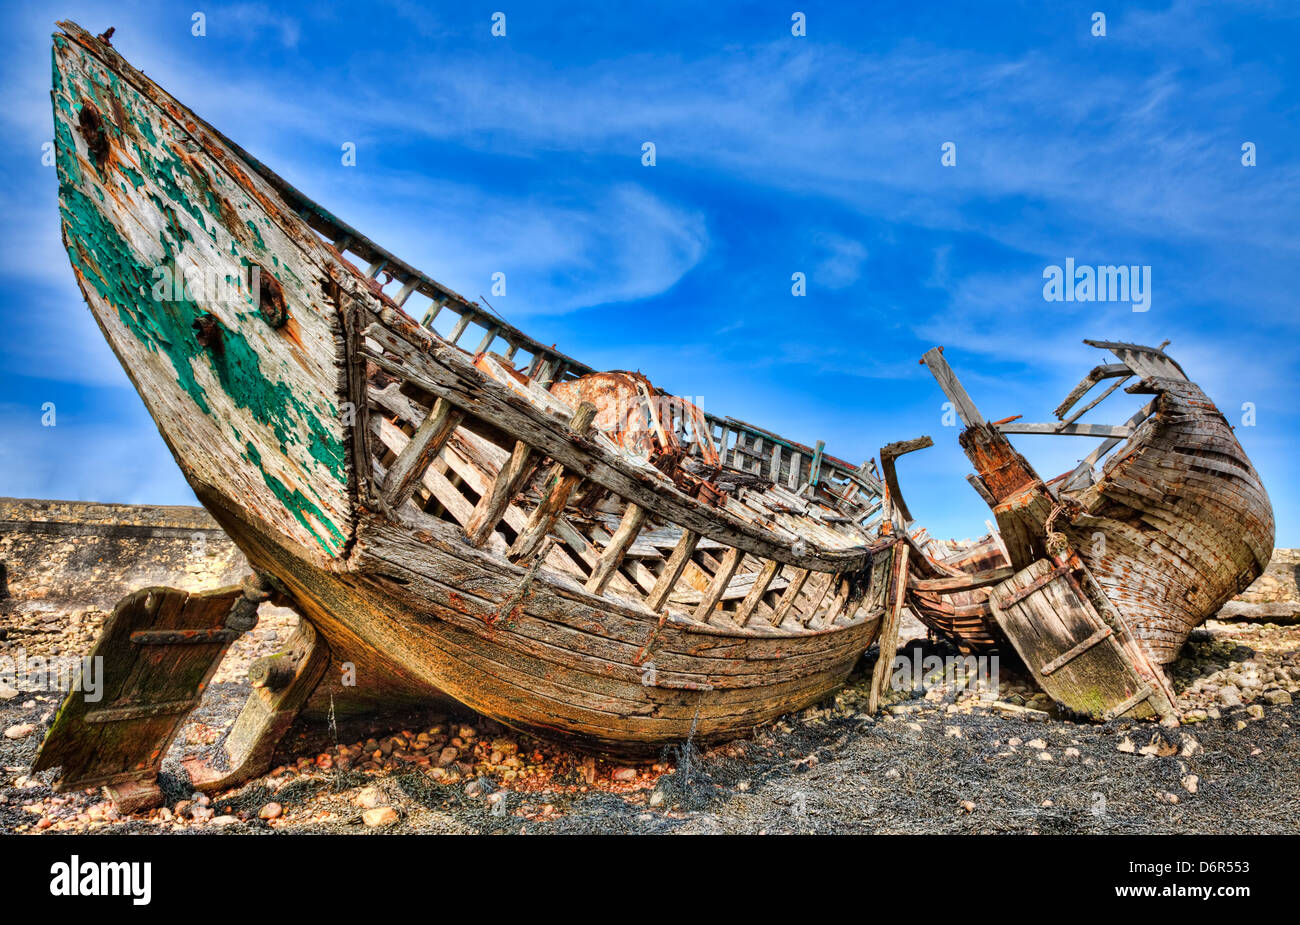 Ships Shipwreck Shipwrecks Stock Photos & Ships Shipwreck ...